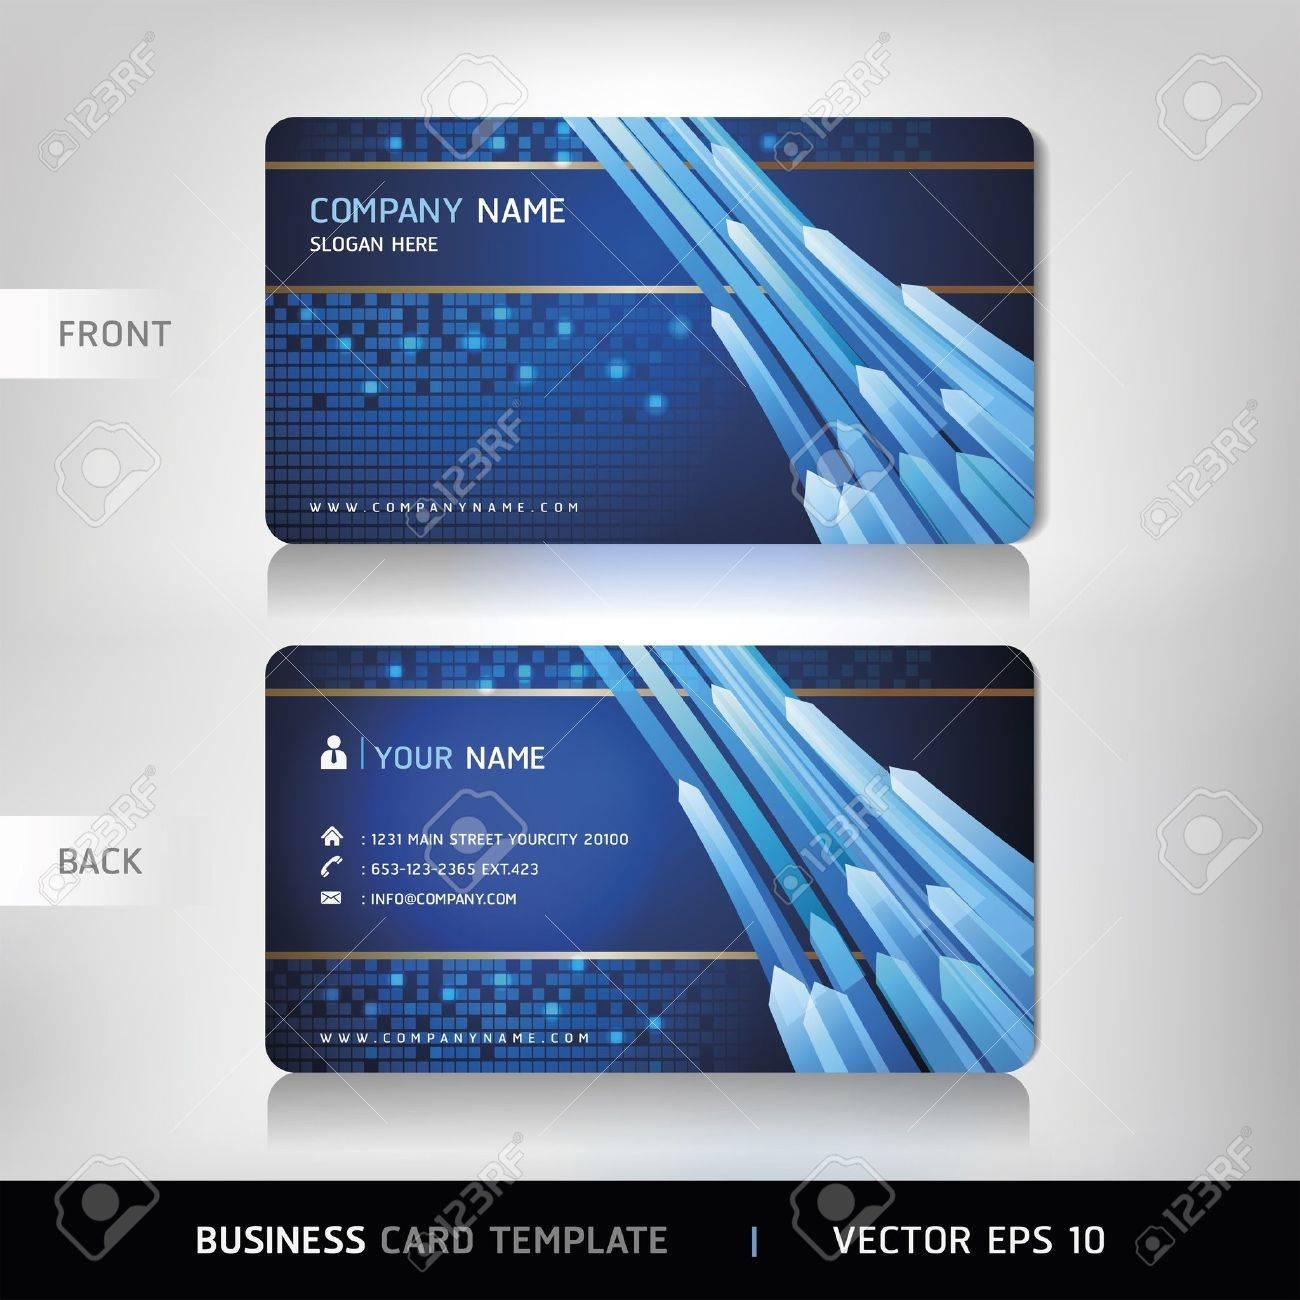 Business Card Set Vector illustration Stock Vector - 18759347